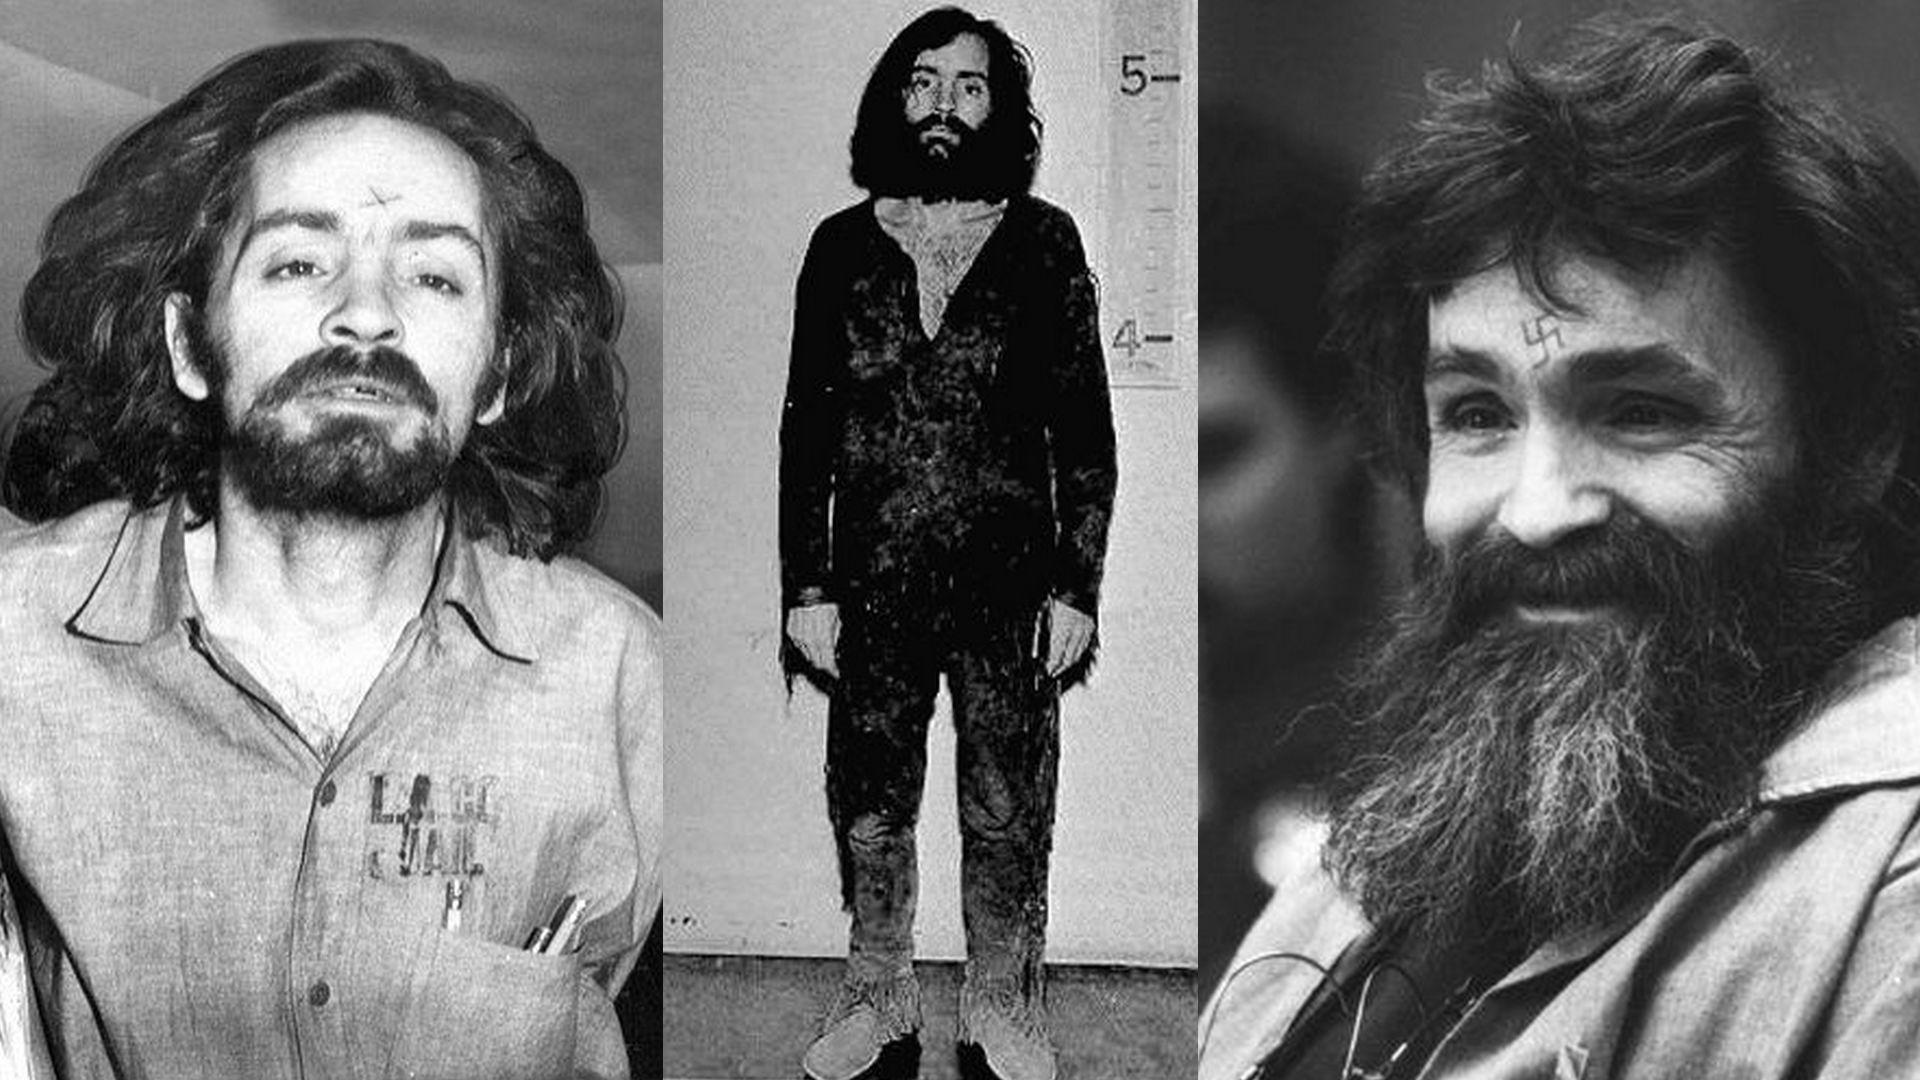 śmierć Charlesa Mansona